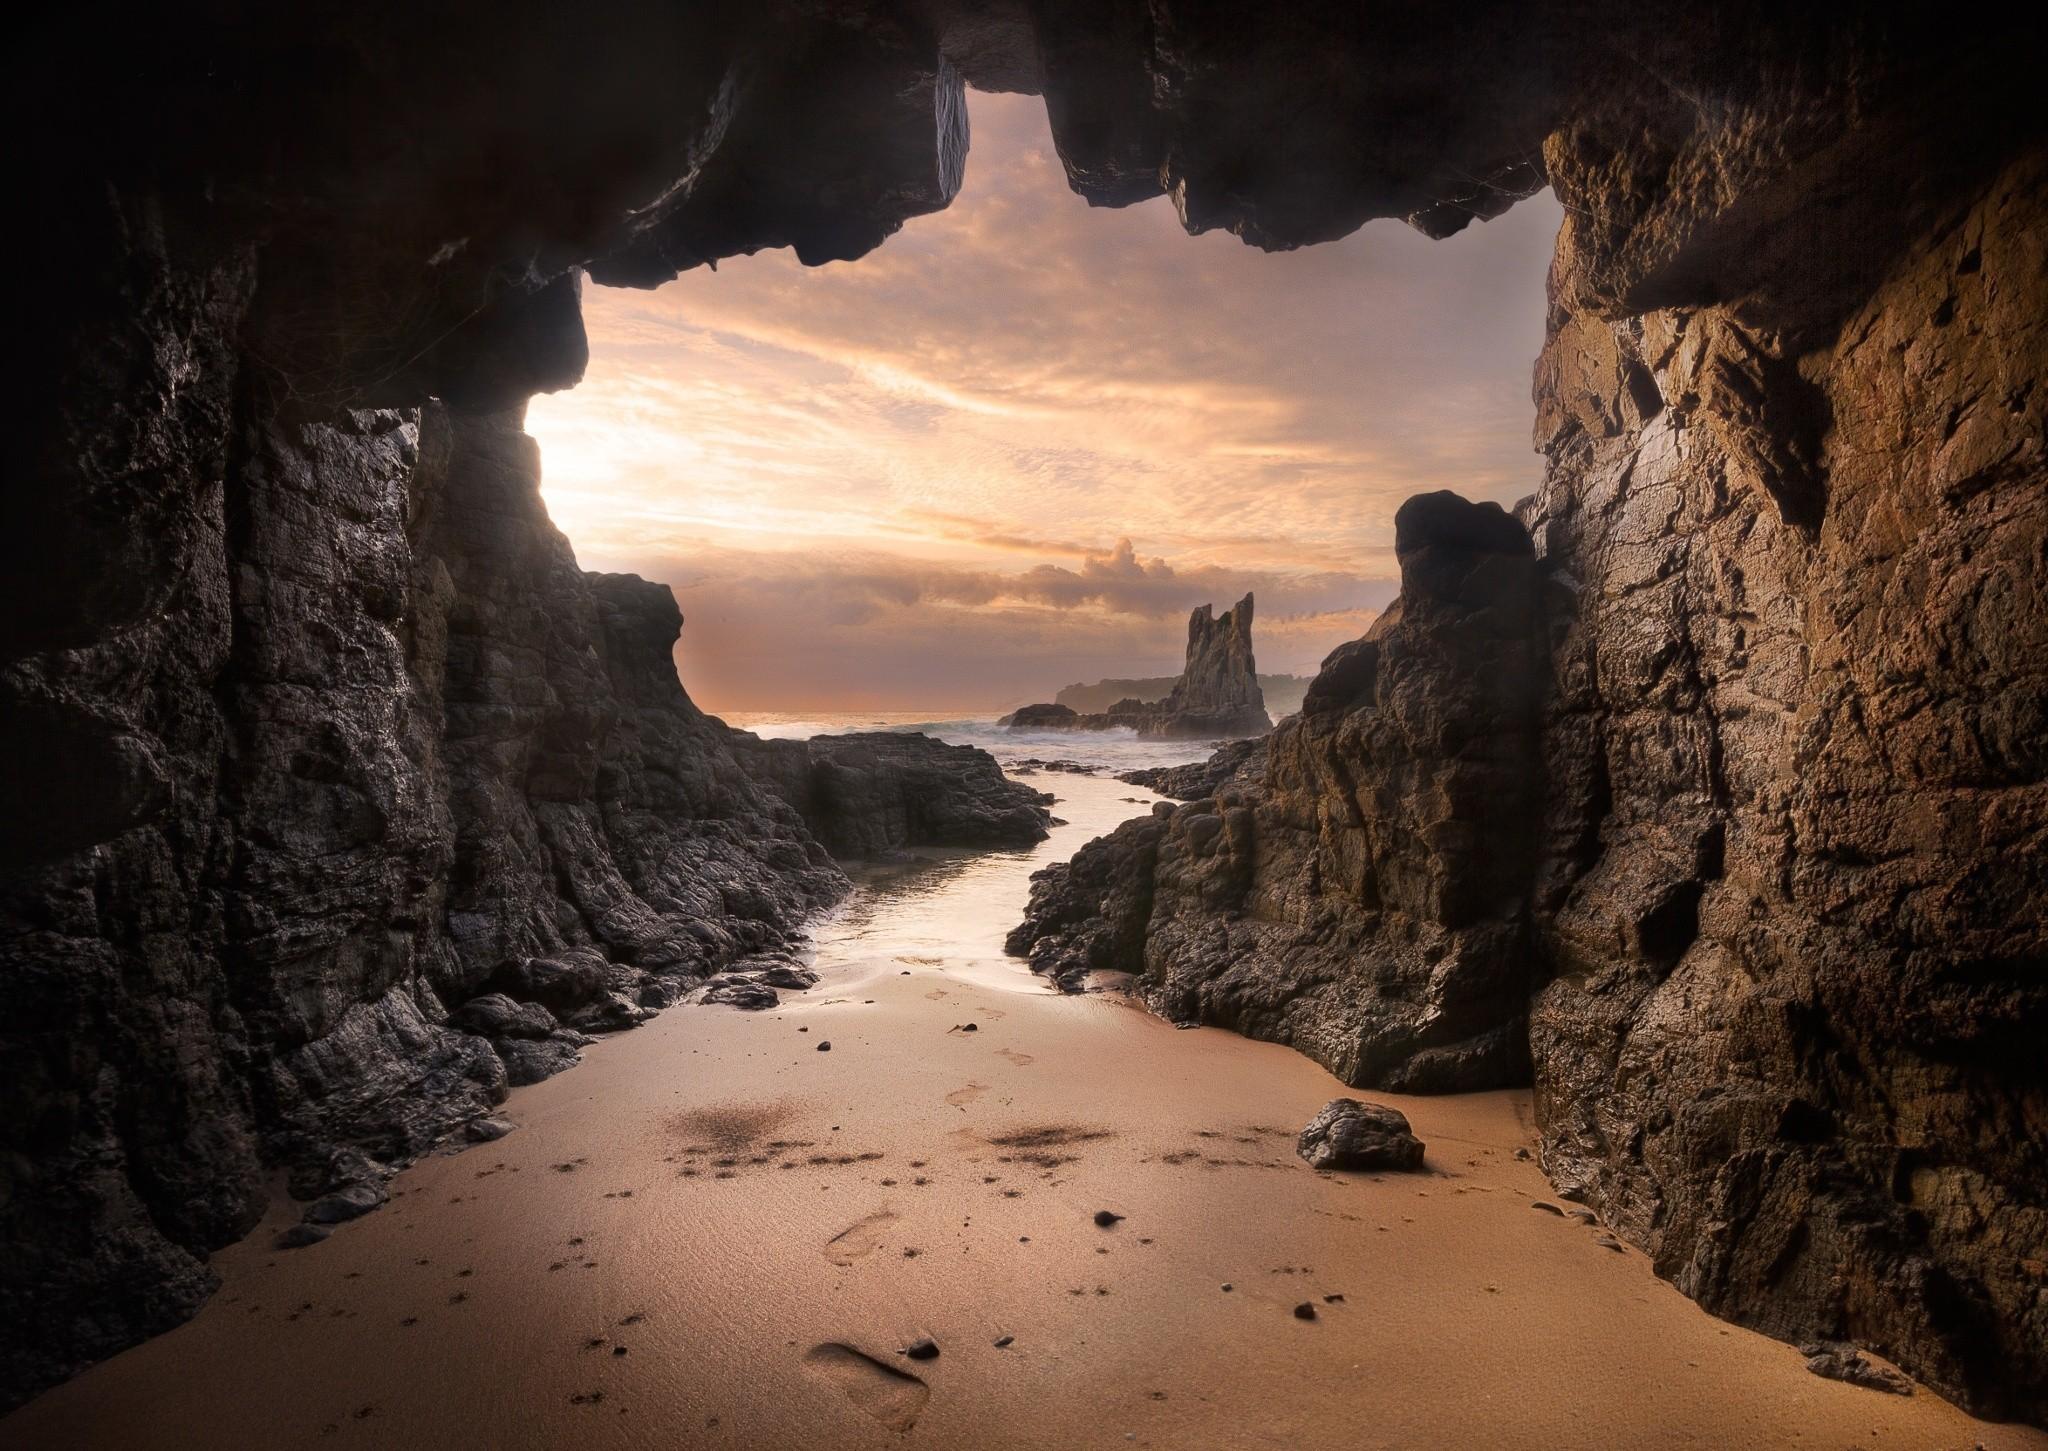 Beach Cave Earth Horizon Ocean Rock Sea 2048x1451